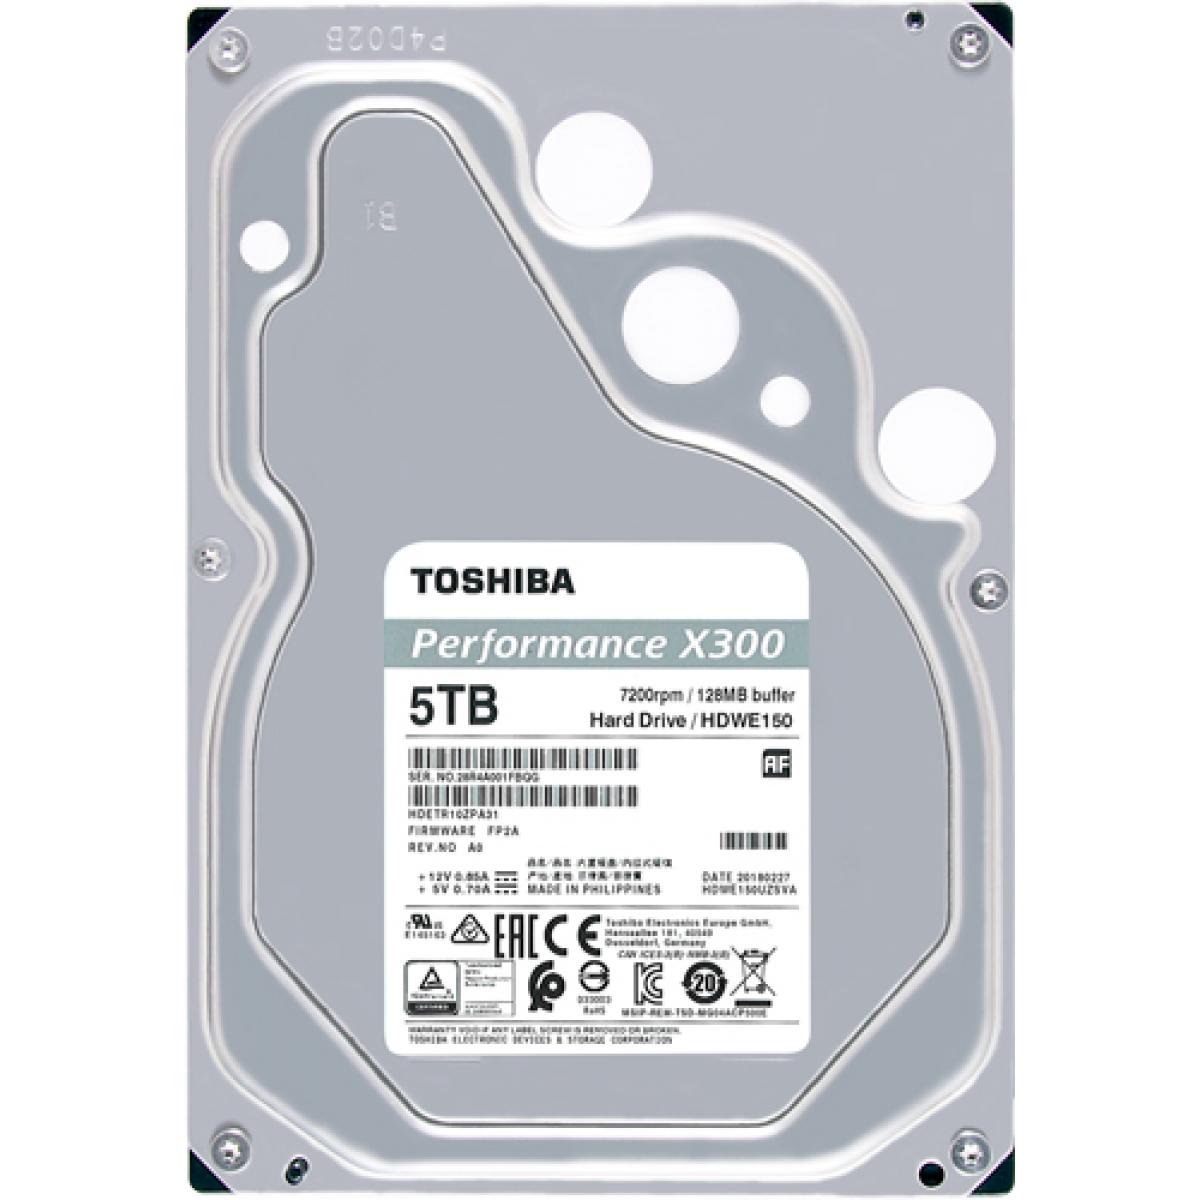 HD Toshiba 5TB X300 Performance e Gaming HDWE150XZSTA 7200 RPM 128MB Sata III Box